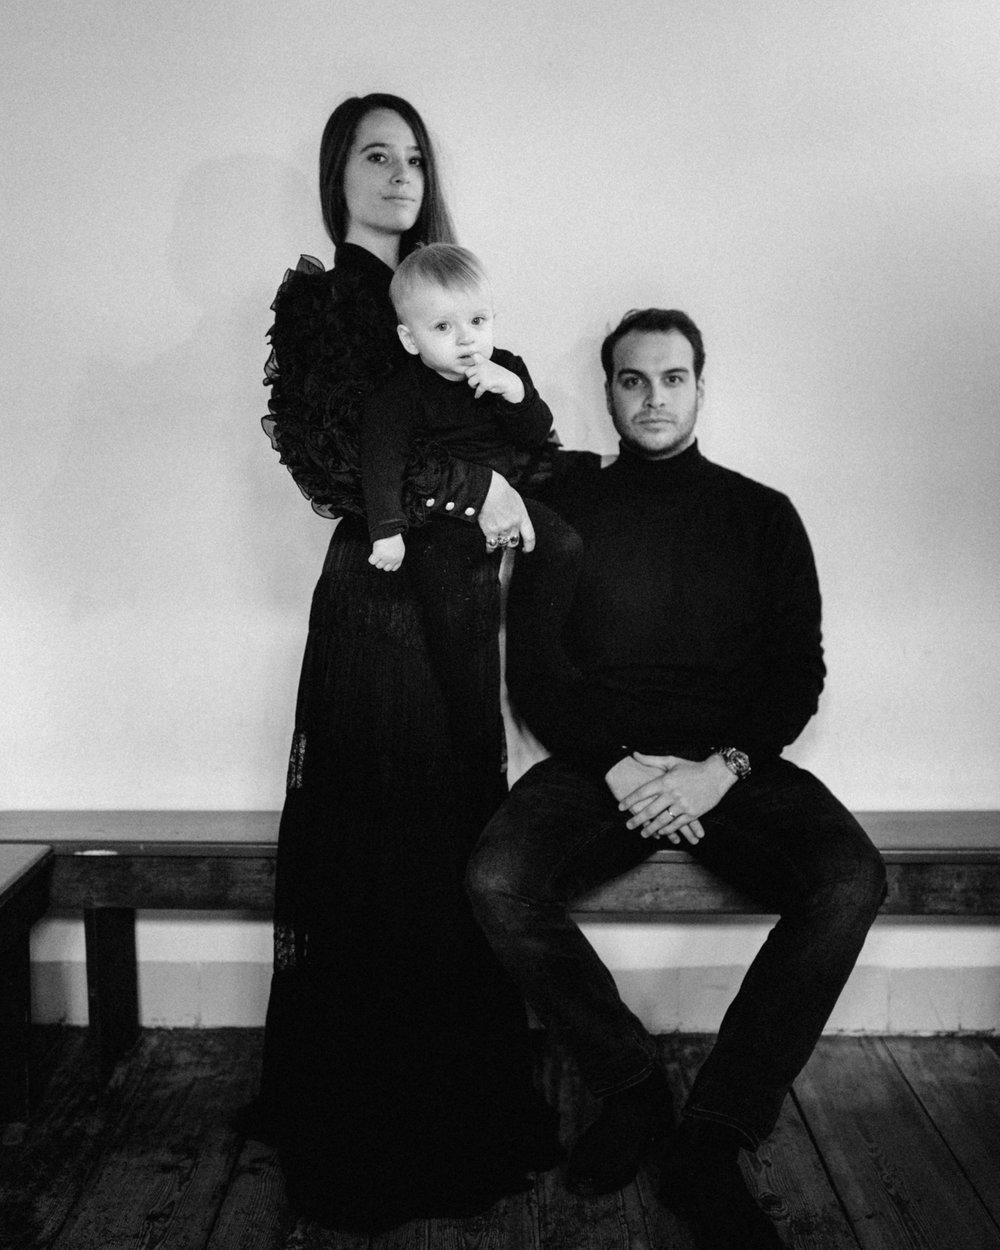 011-sjoerdbooijphotography-family-daan-lotte-bond.jpg